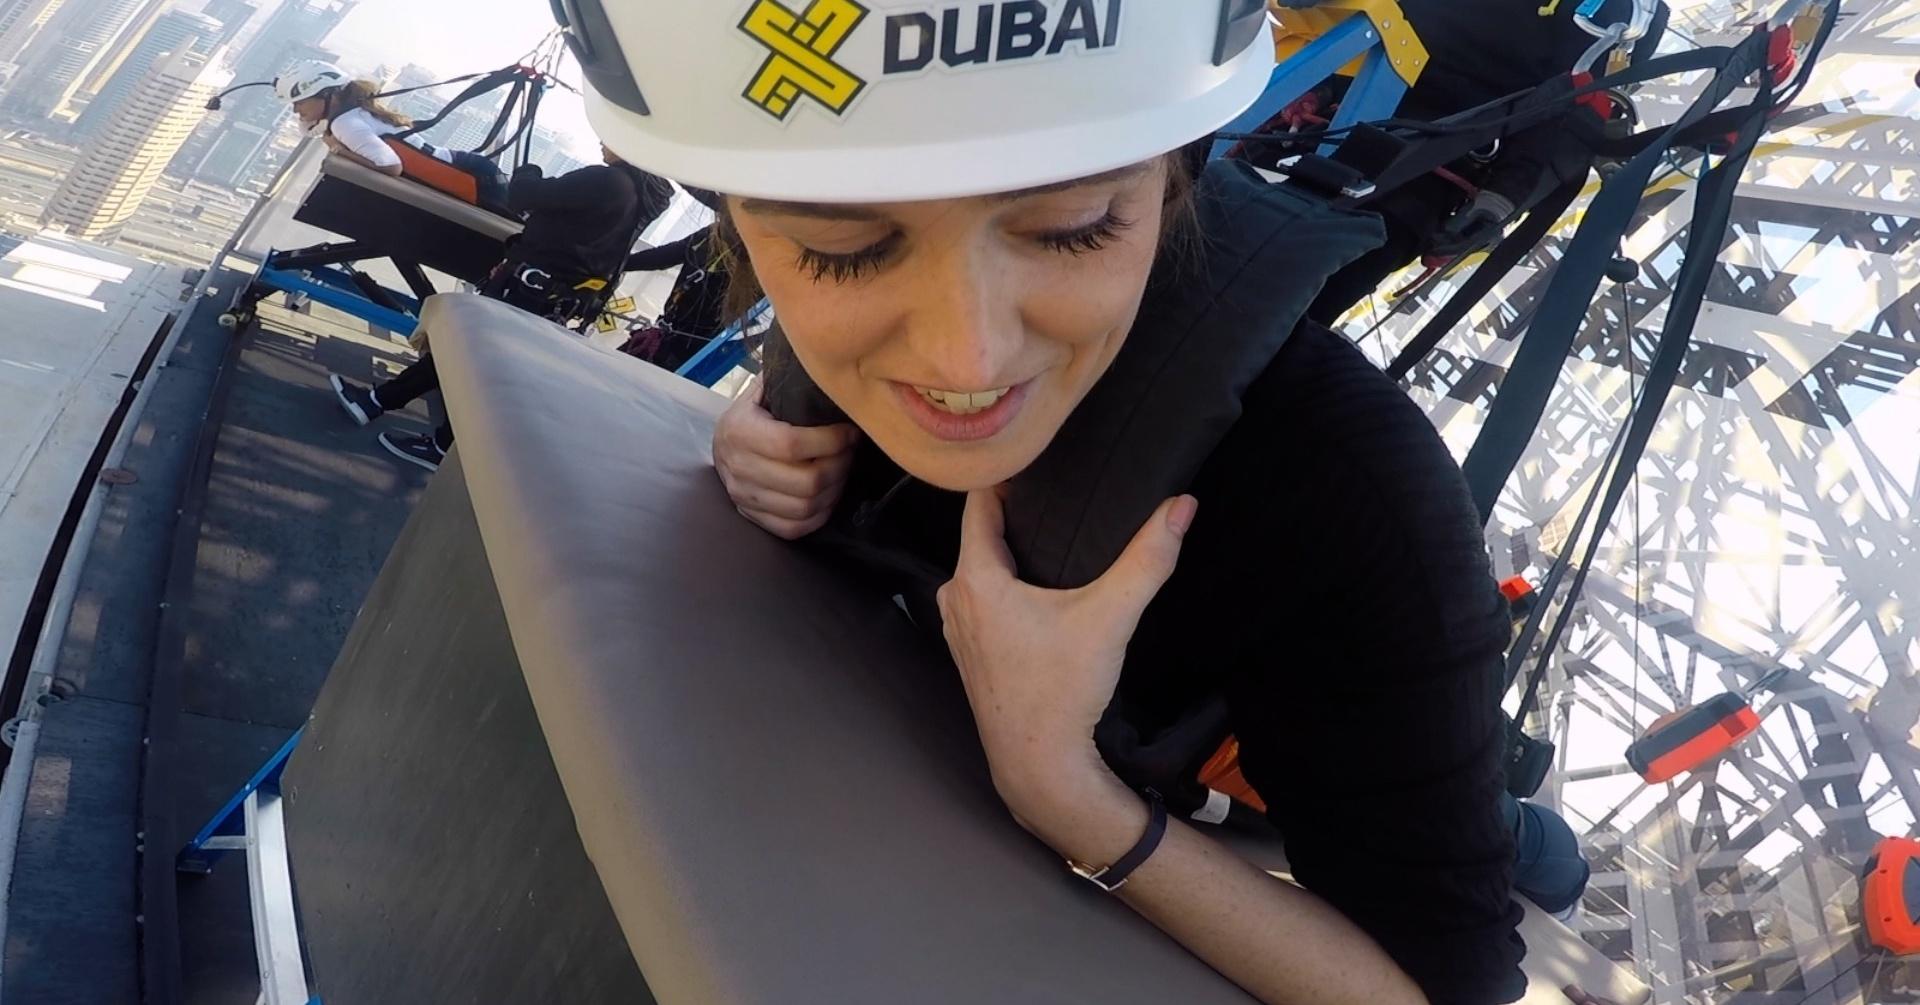 Xline Dubai Marina zipline experience